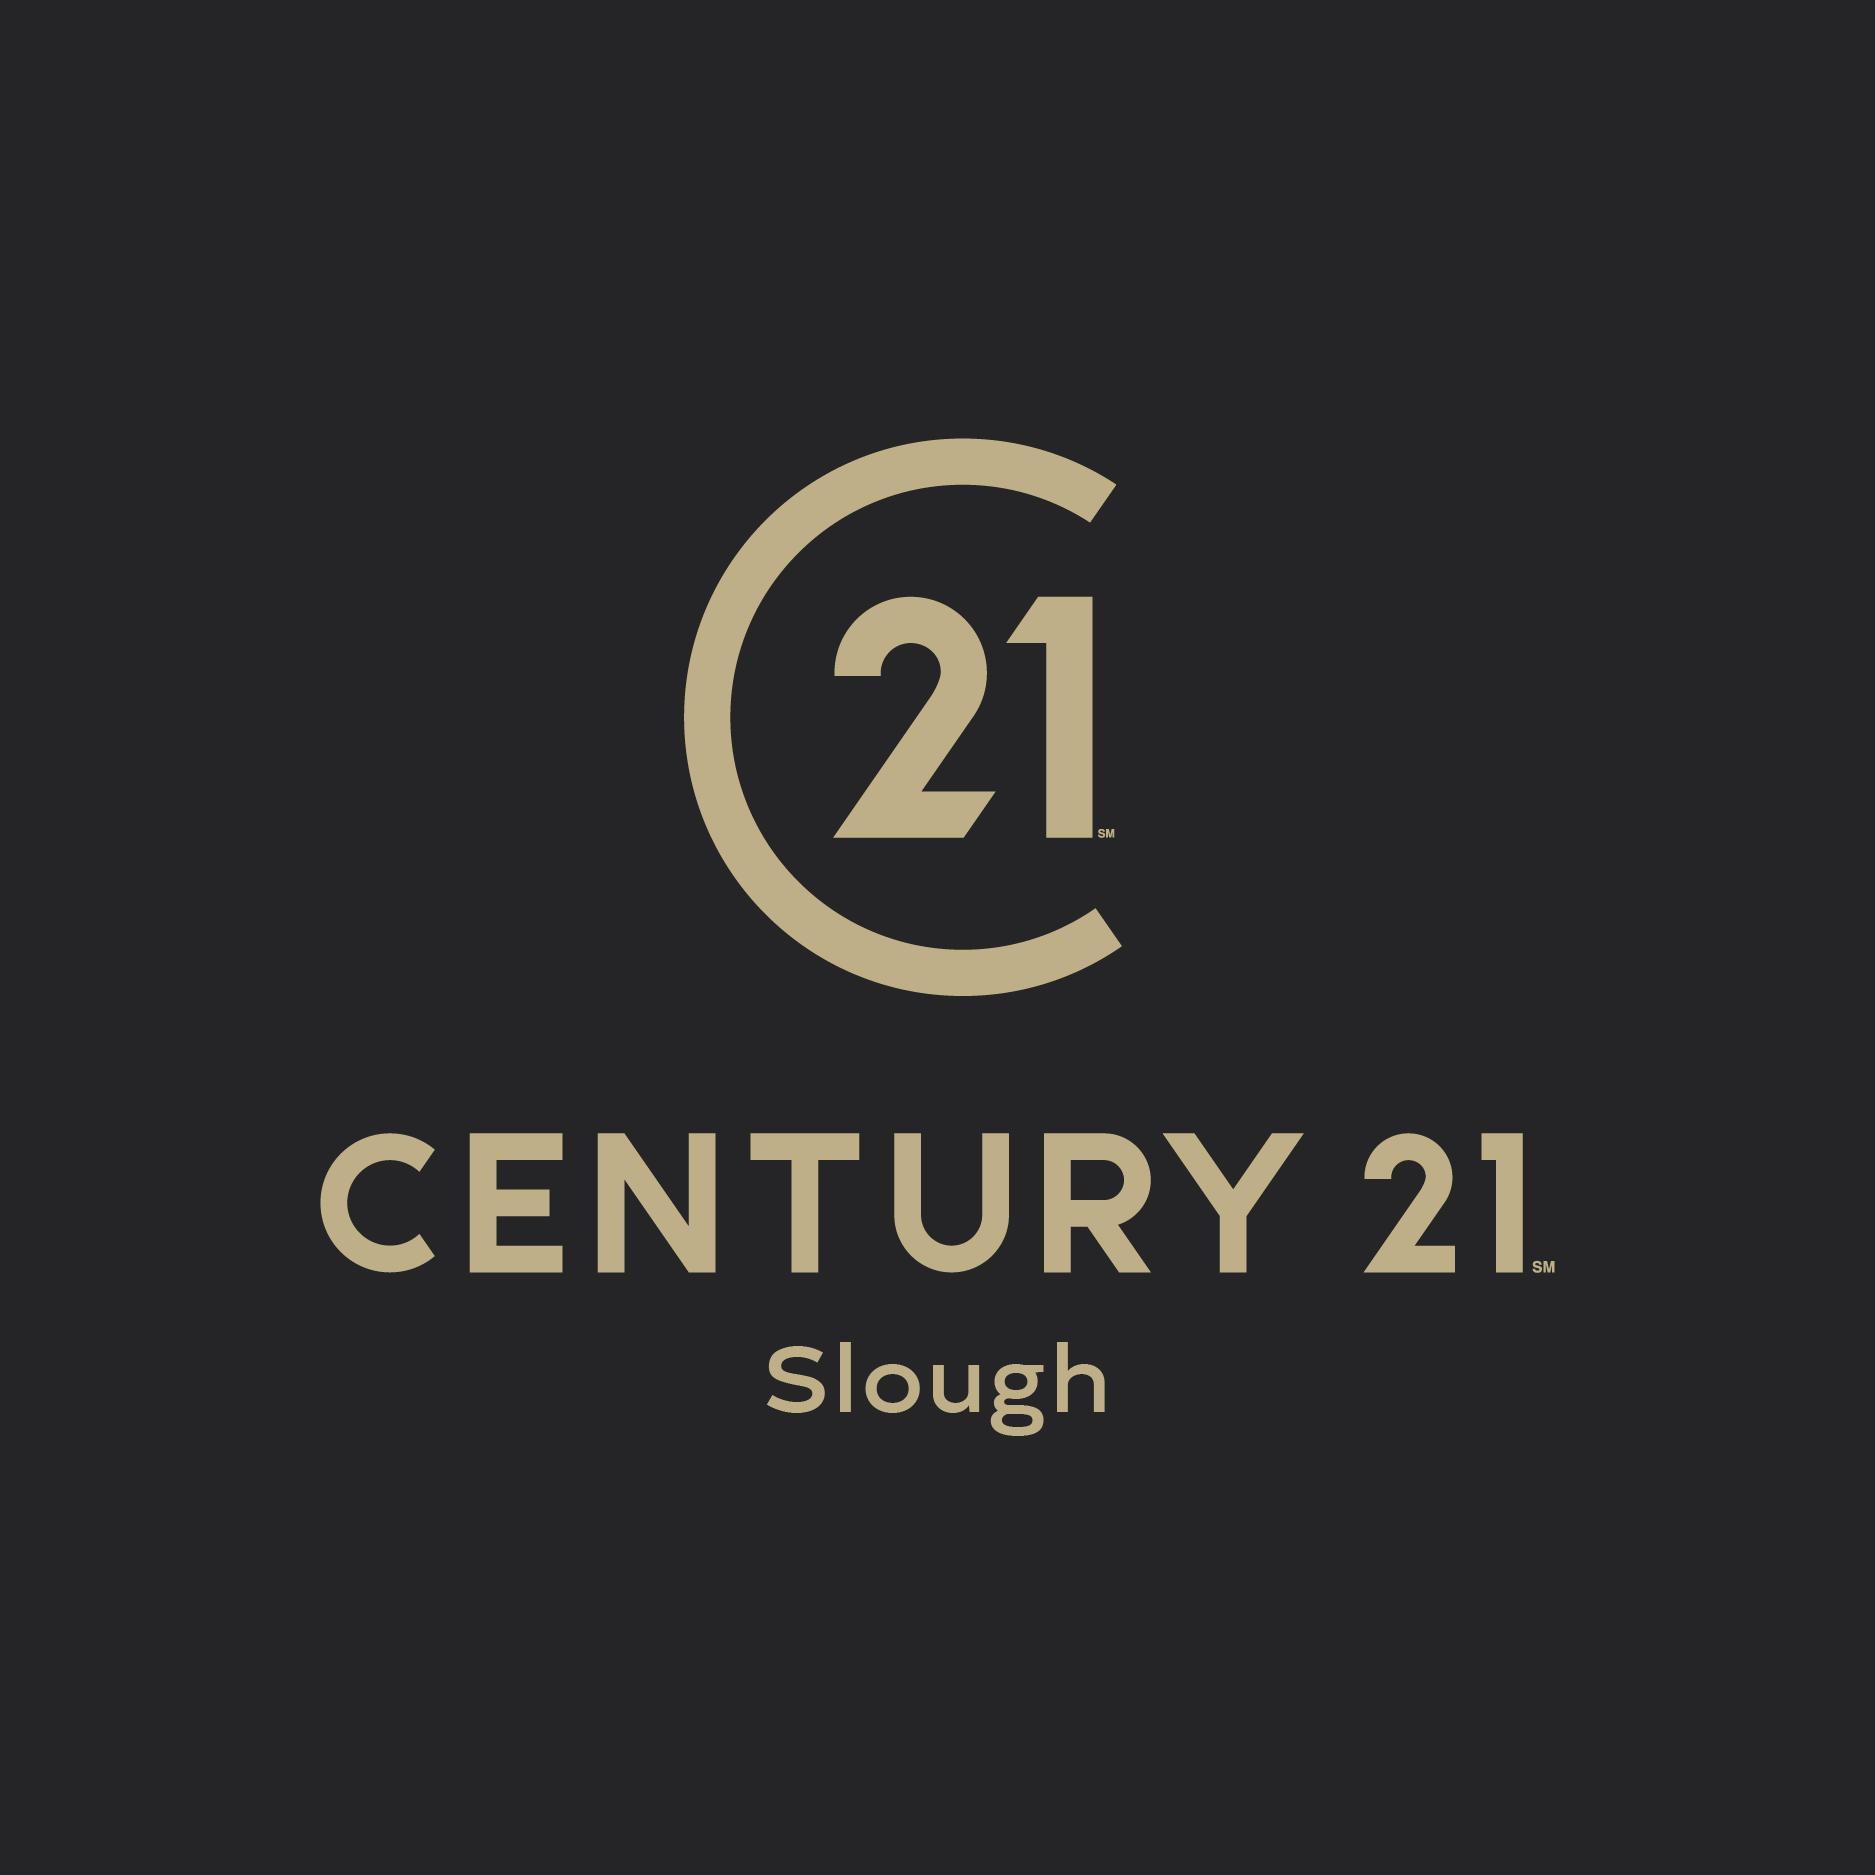 Century 21 - Slough